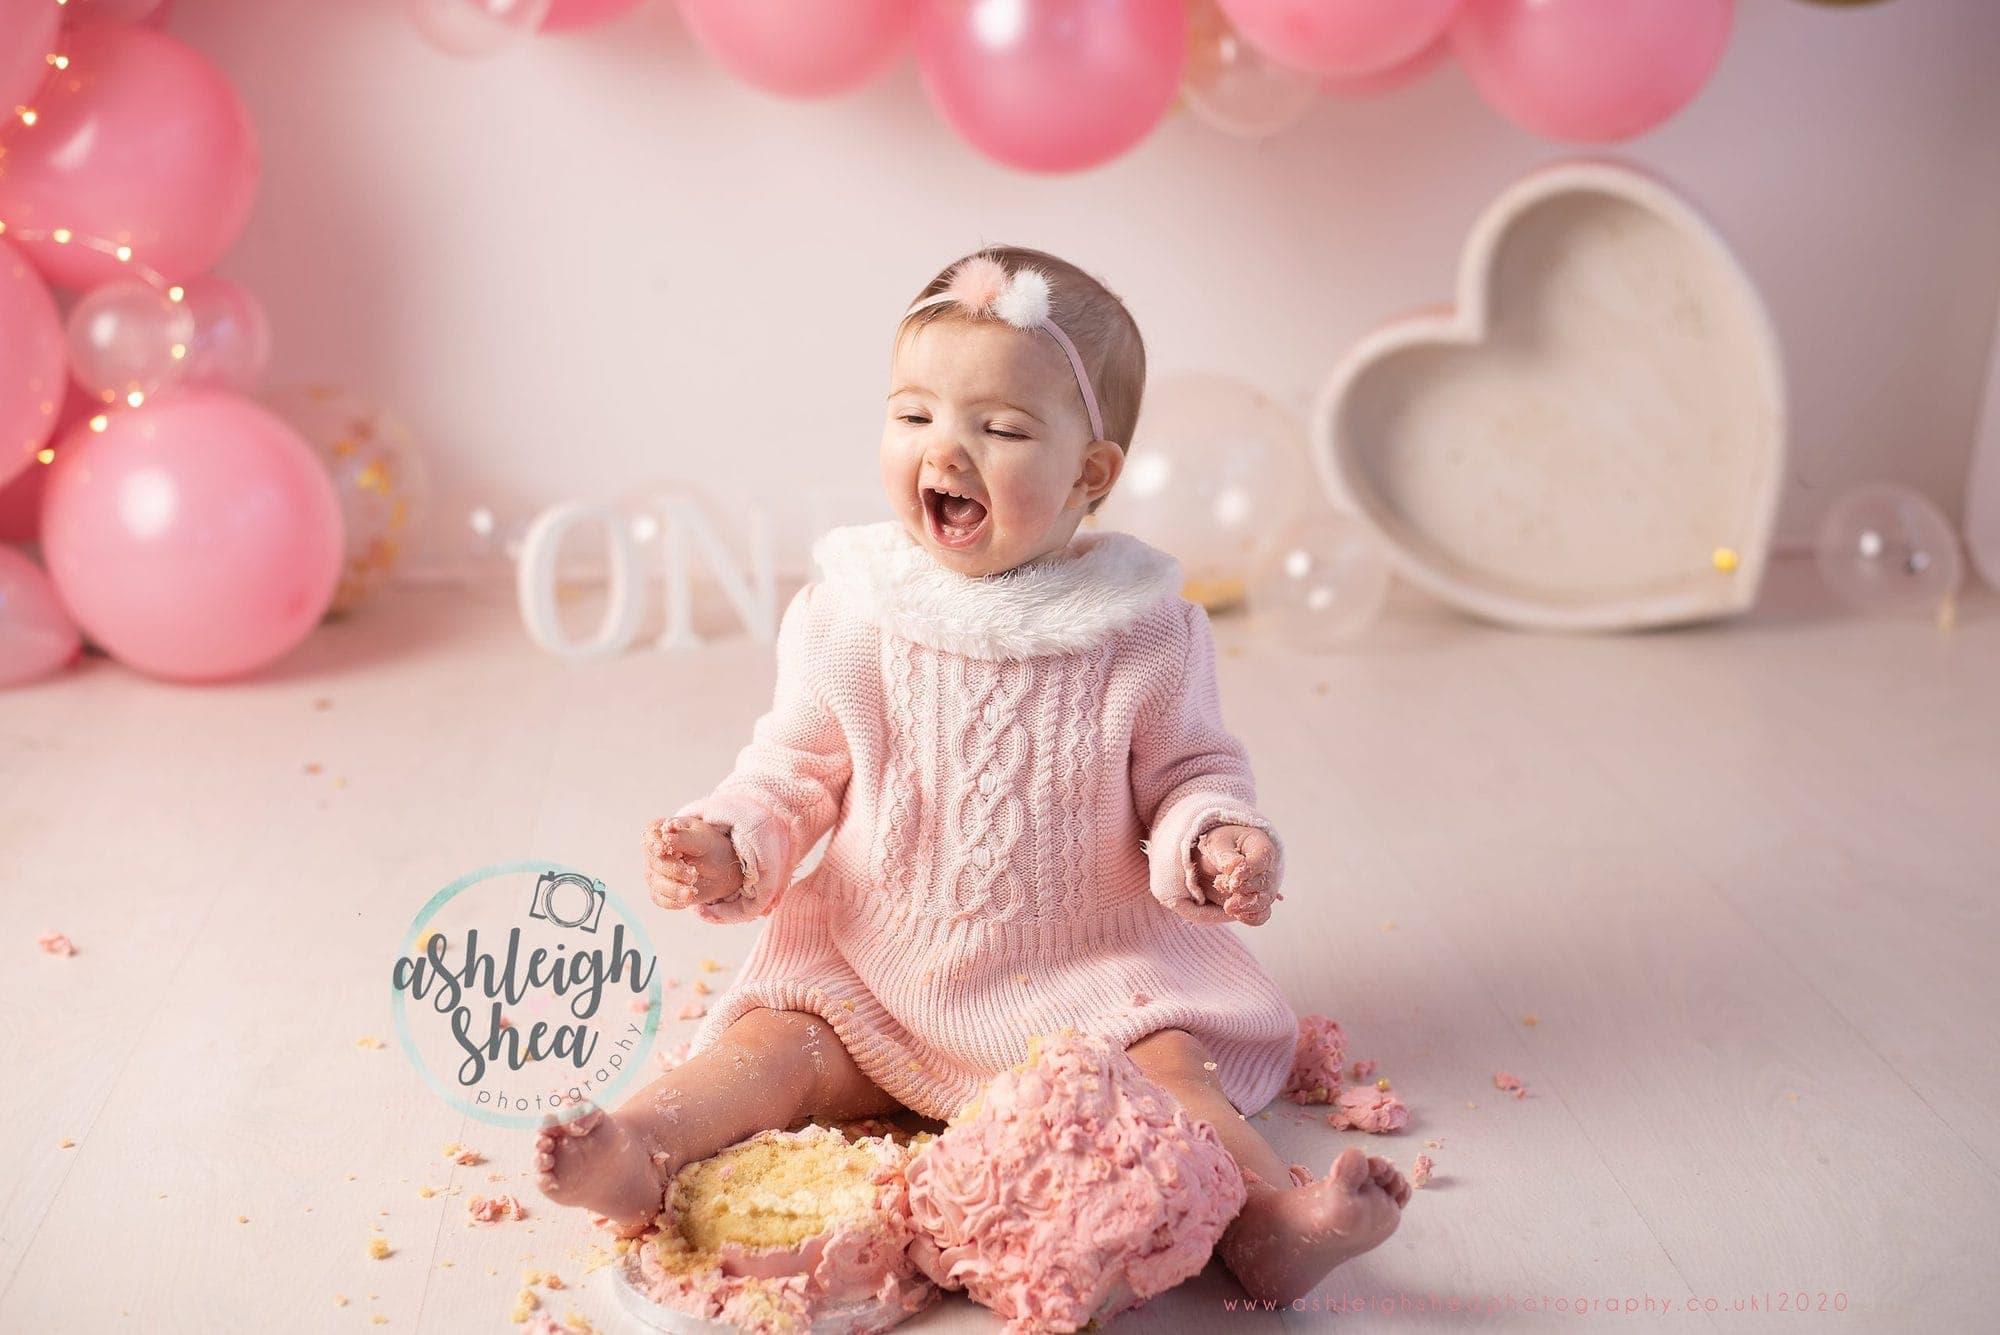 Happy, Baby Girl, Toddler, Cake, Cake Smash Photographer, Pink and Gold, Ashleigh Shea Photography, Bromley